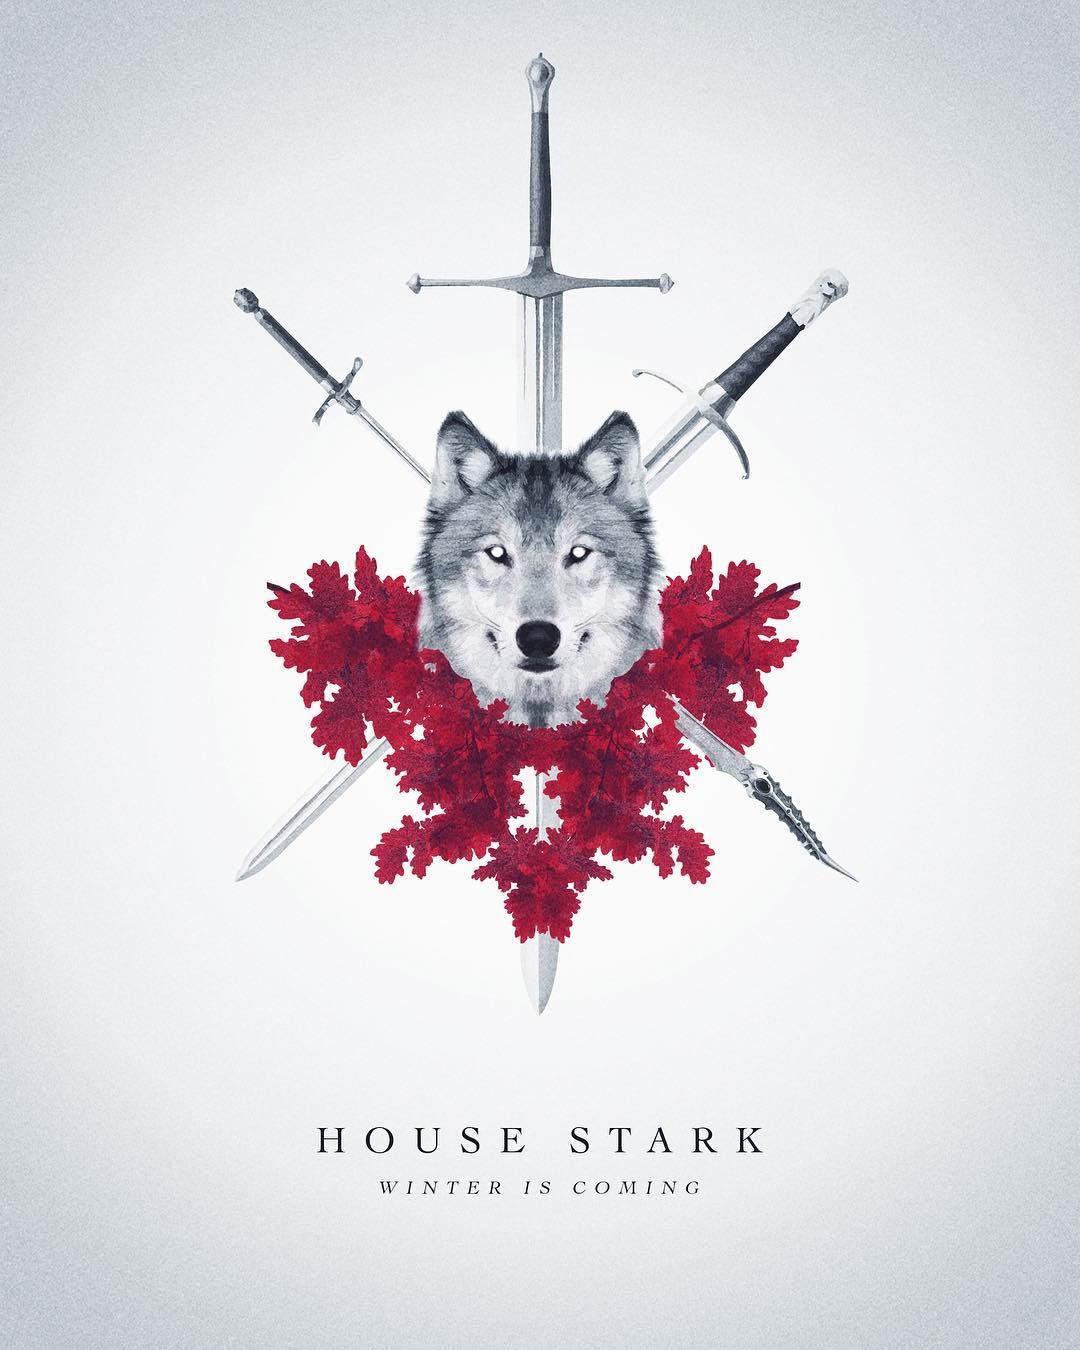 House Stark Poster By Max Beech Creative #direwolf #HouseStark #symbol  #GameofThrones